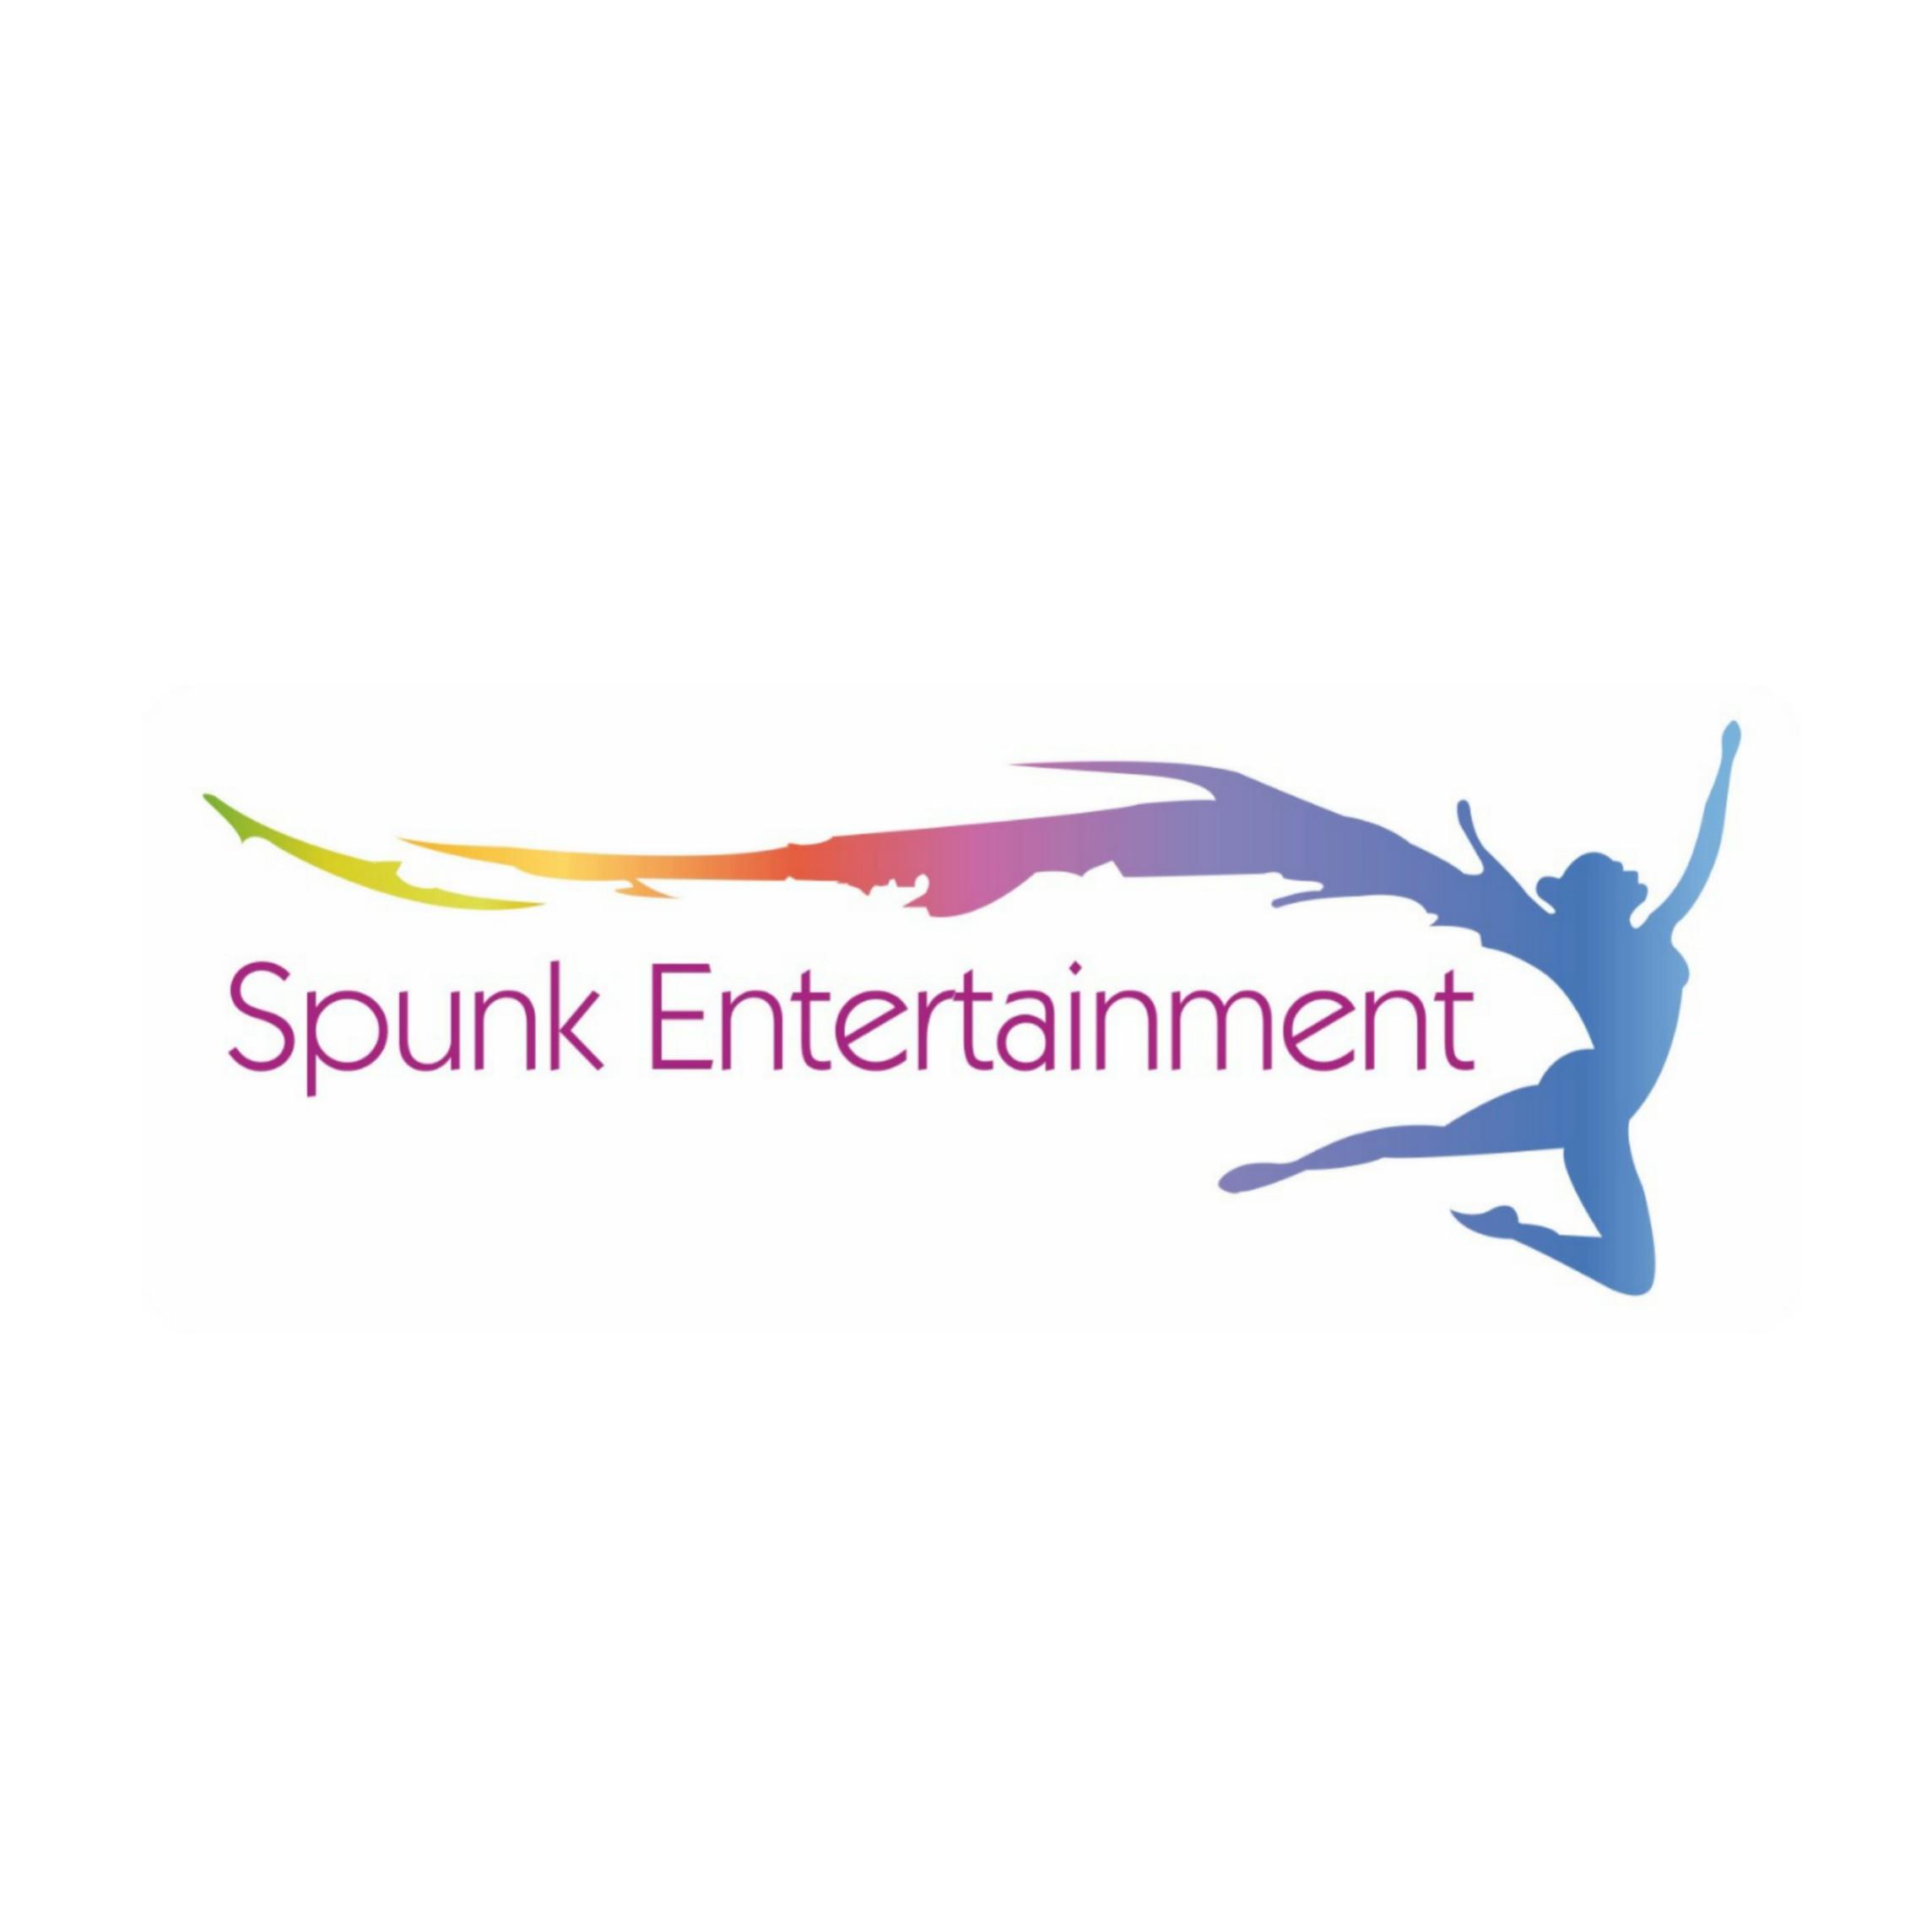 Spunk Entertainment